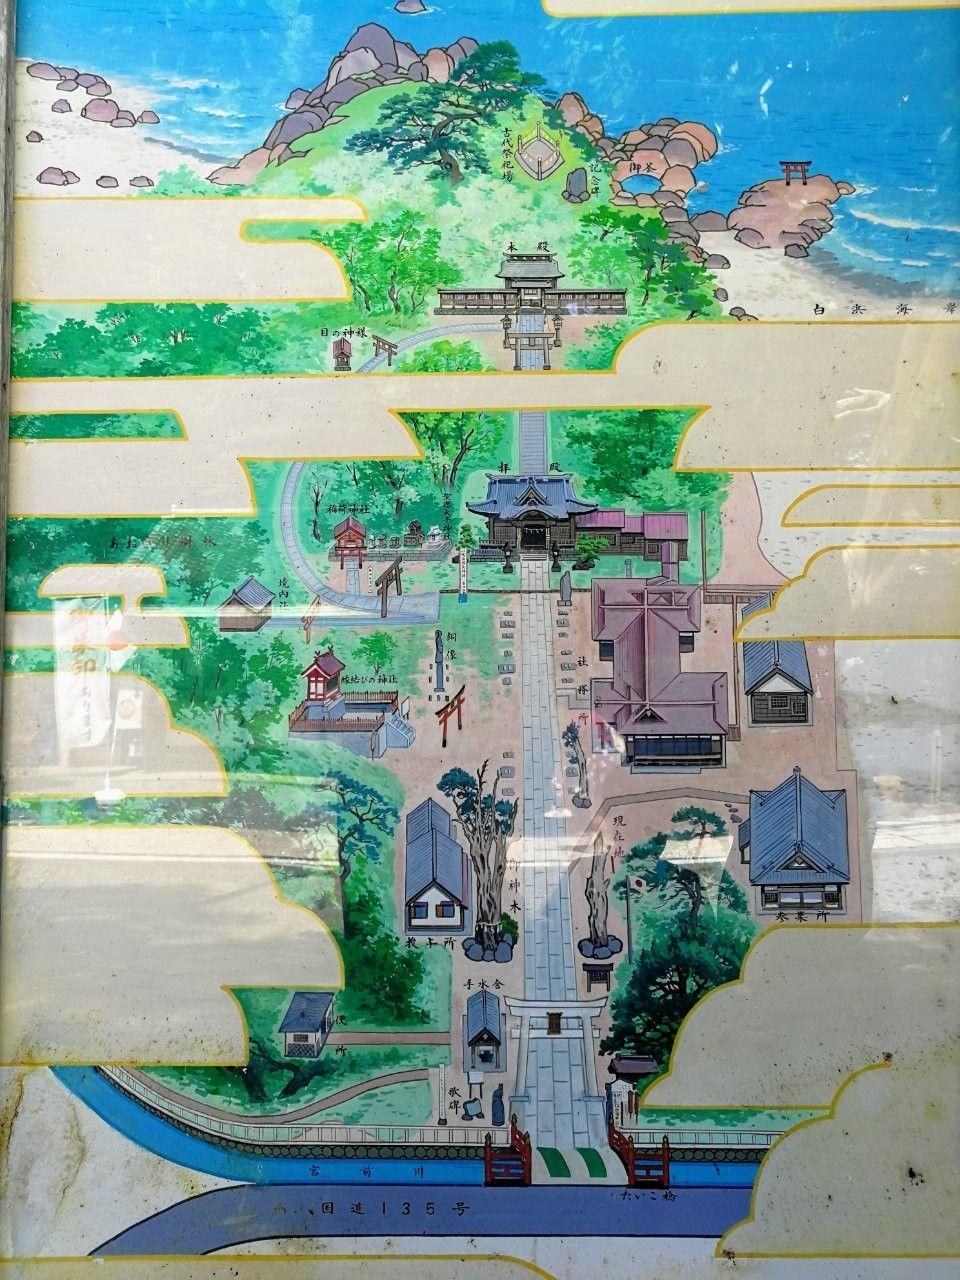 f:id:adagio-nijiiro:20190529101249j:image